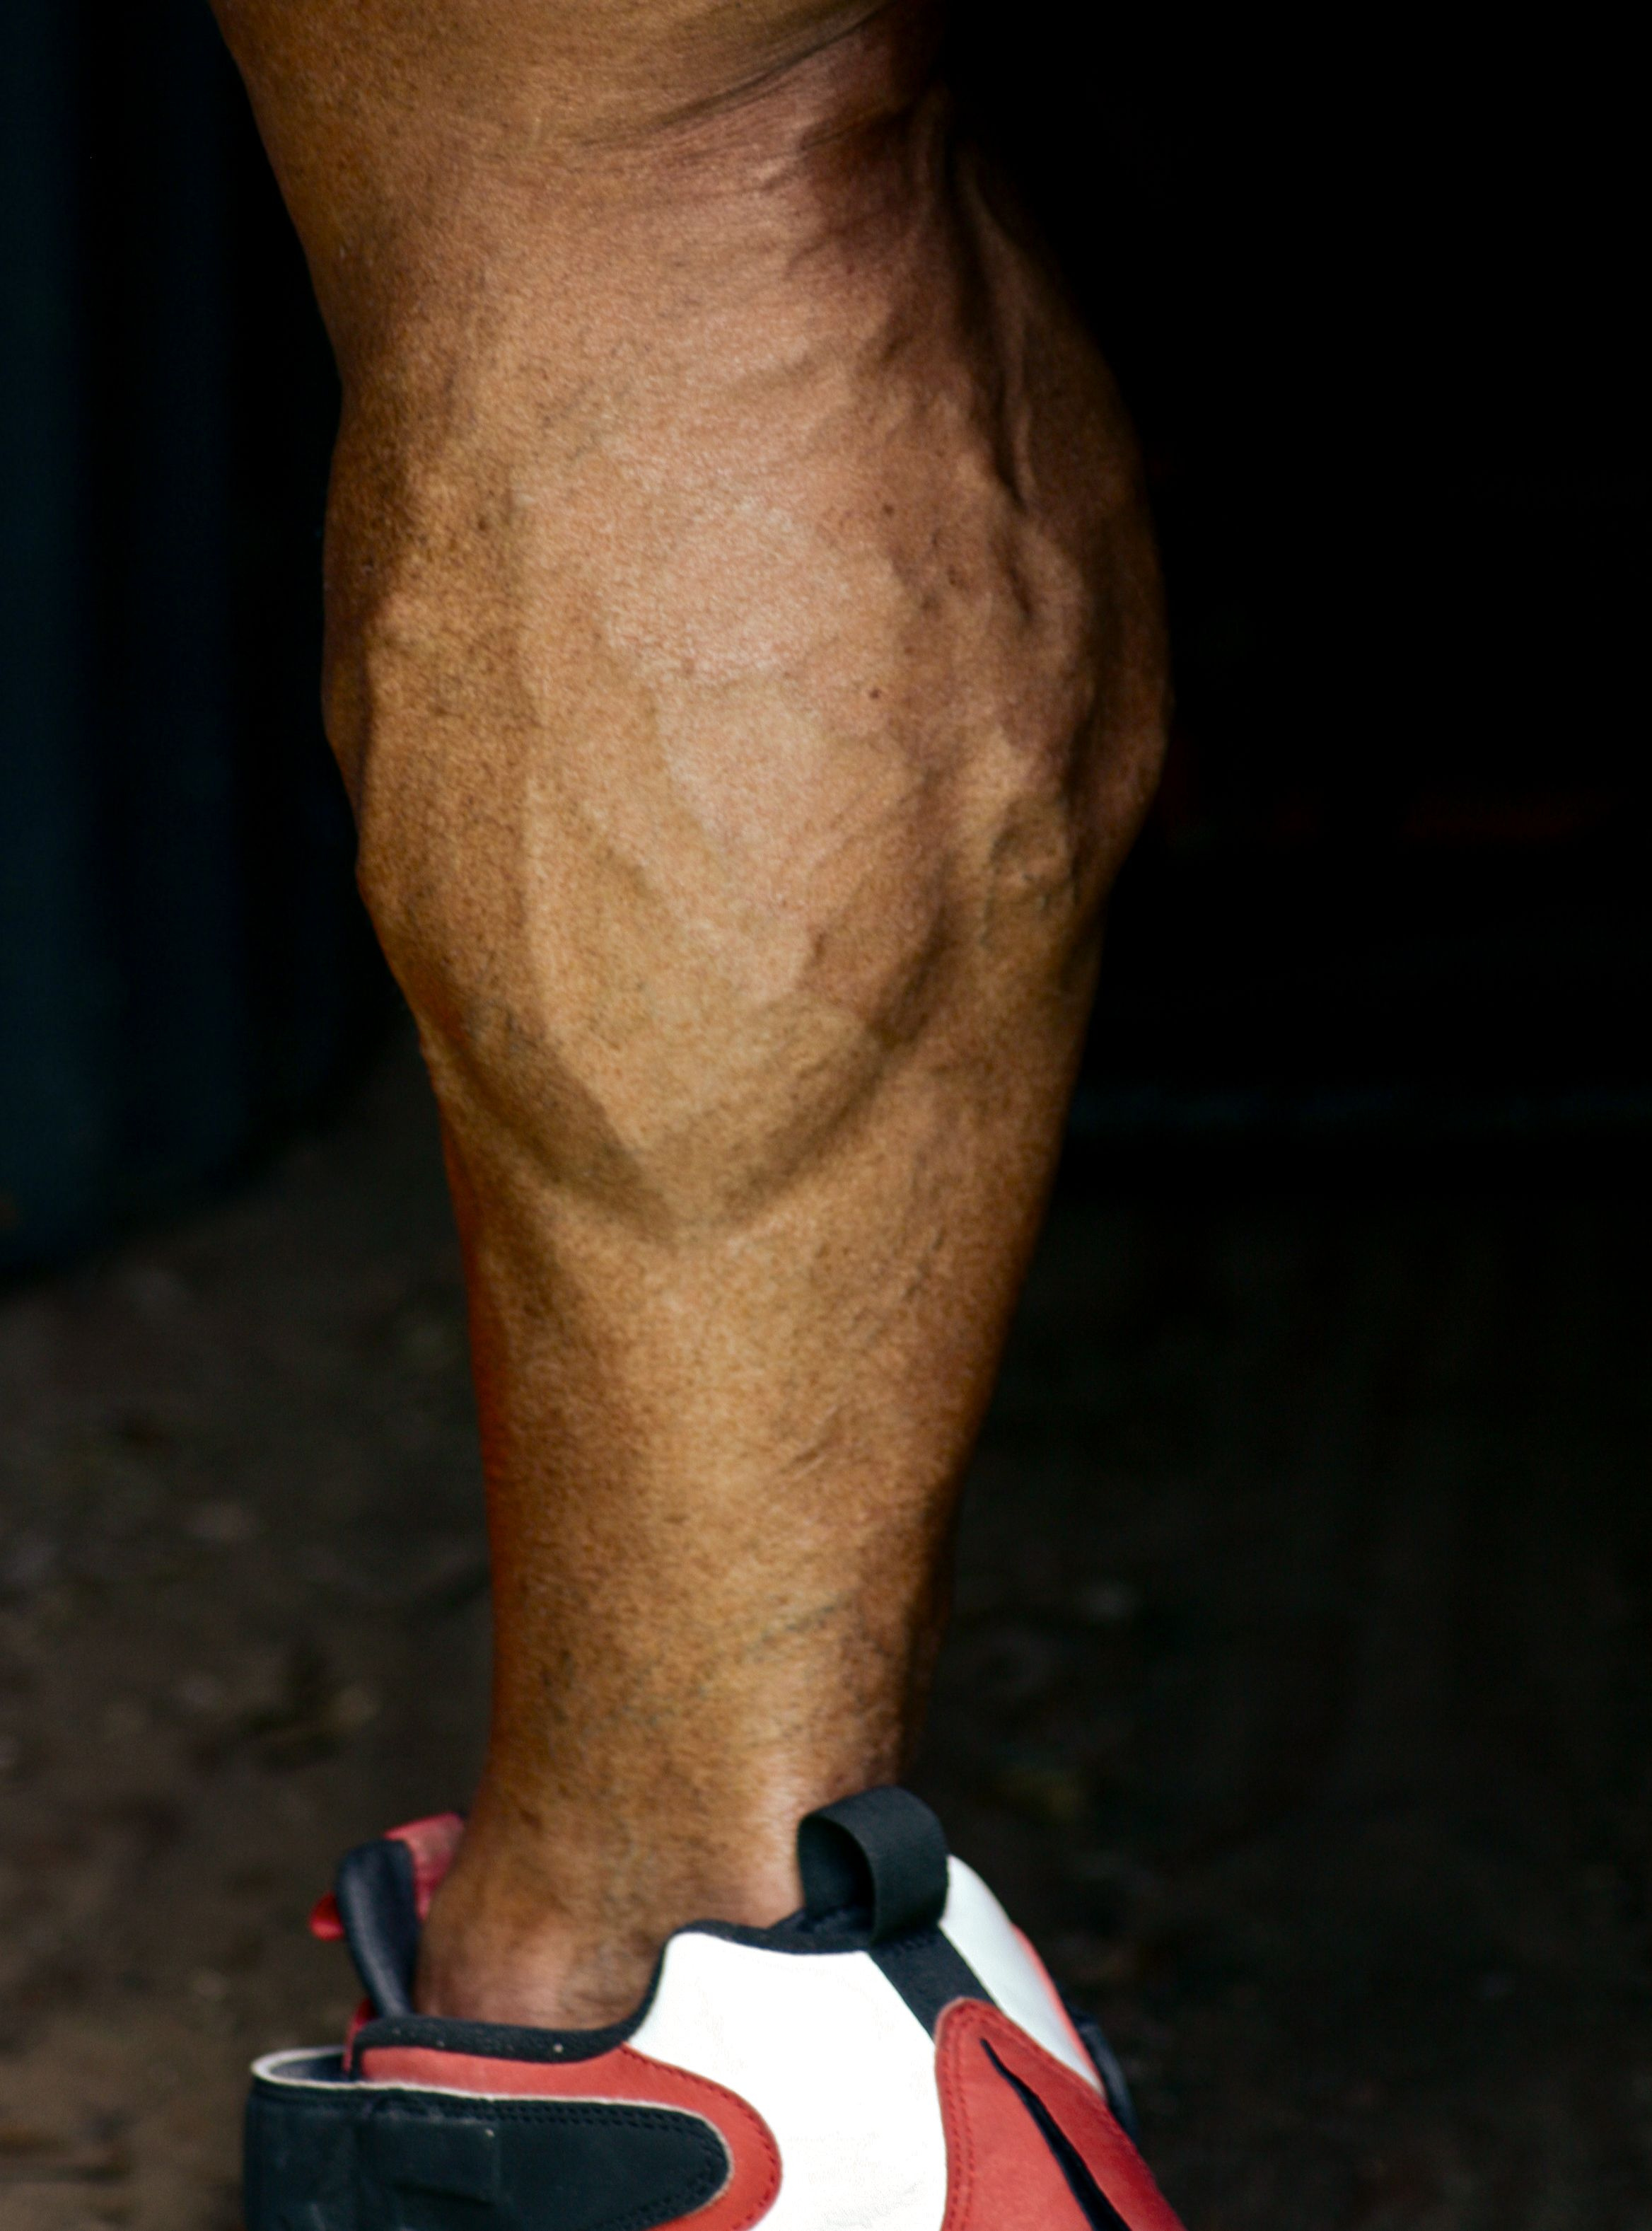 2015 Physique Model Fitness Shoot John Joseph Quinlan Calf Close Up #JohnQuinlan